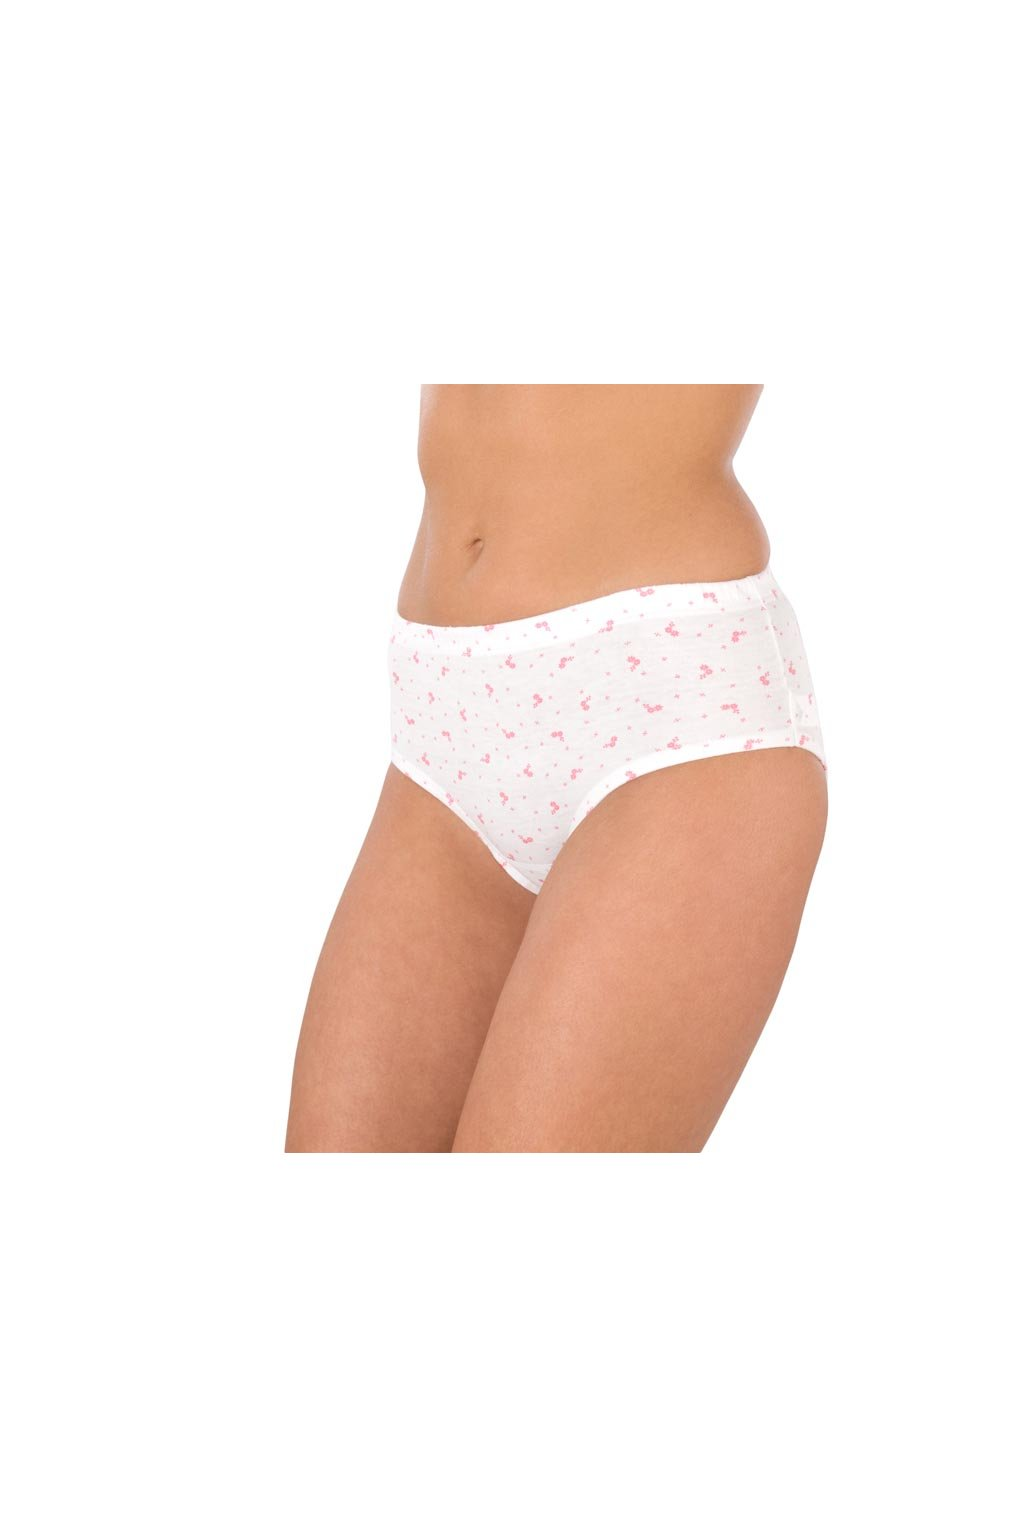 Dámské kalhotky, 100HELENA 1, bílá